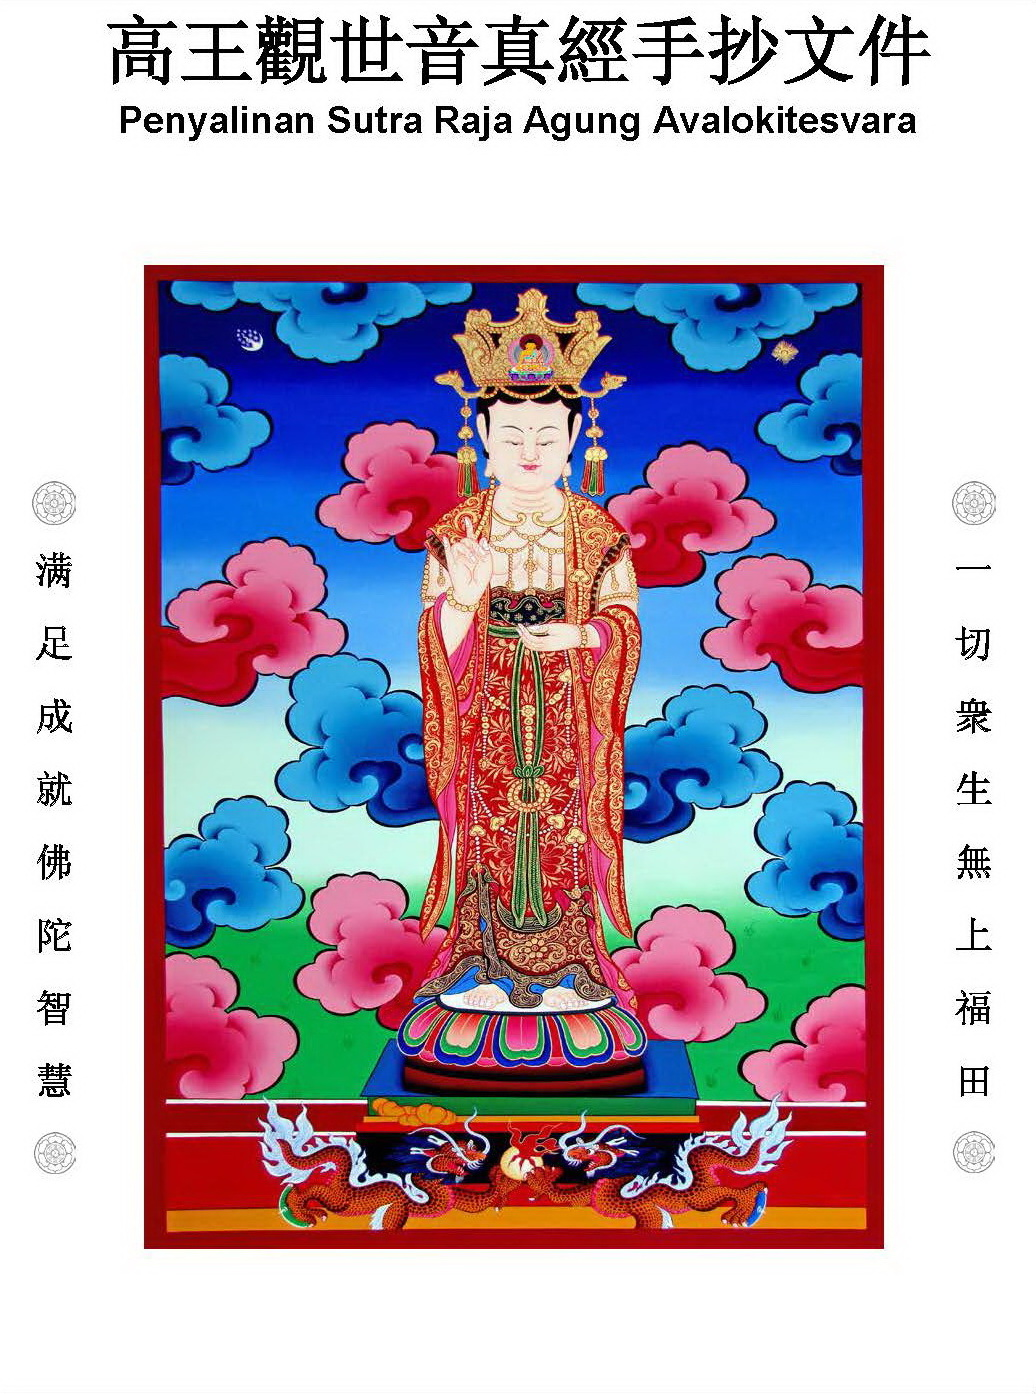 salin sutra raja agung avalokitesvara 2 Penyalinan Sutra